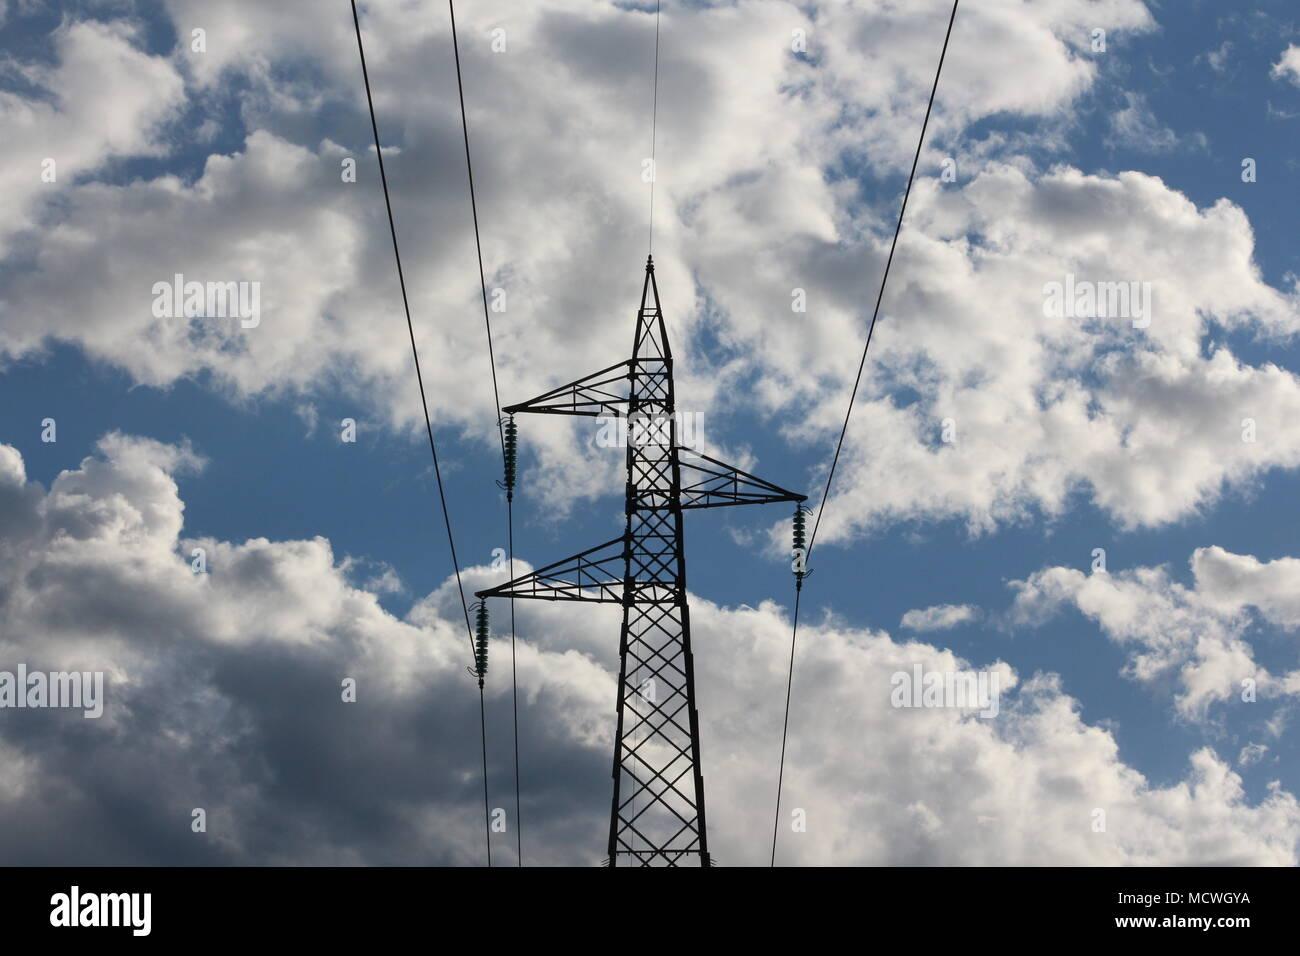 Electric Line Stockfotos & Electric Line Bilder - Alamy